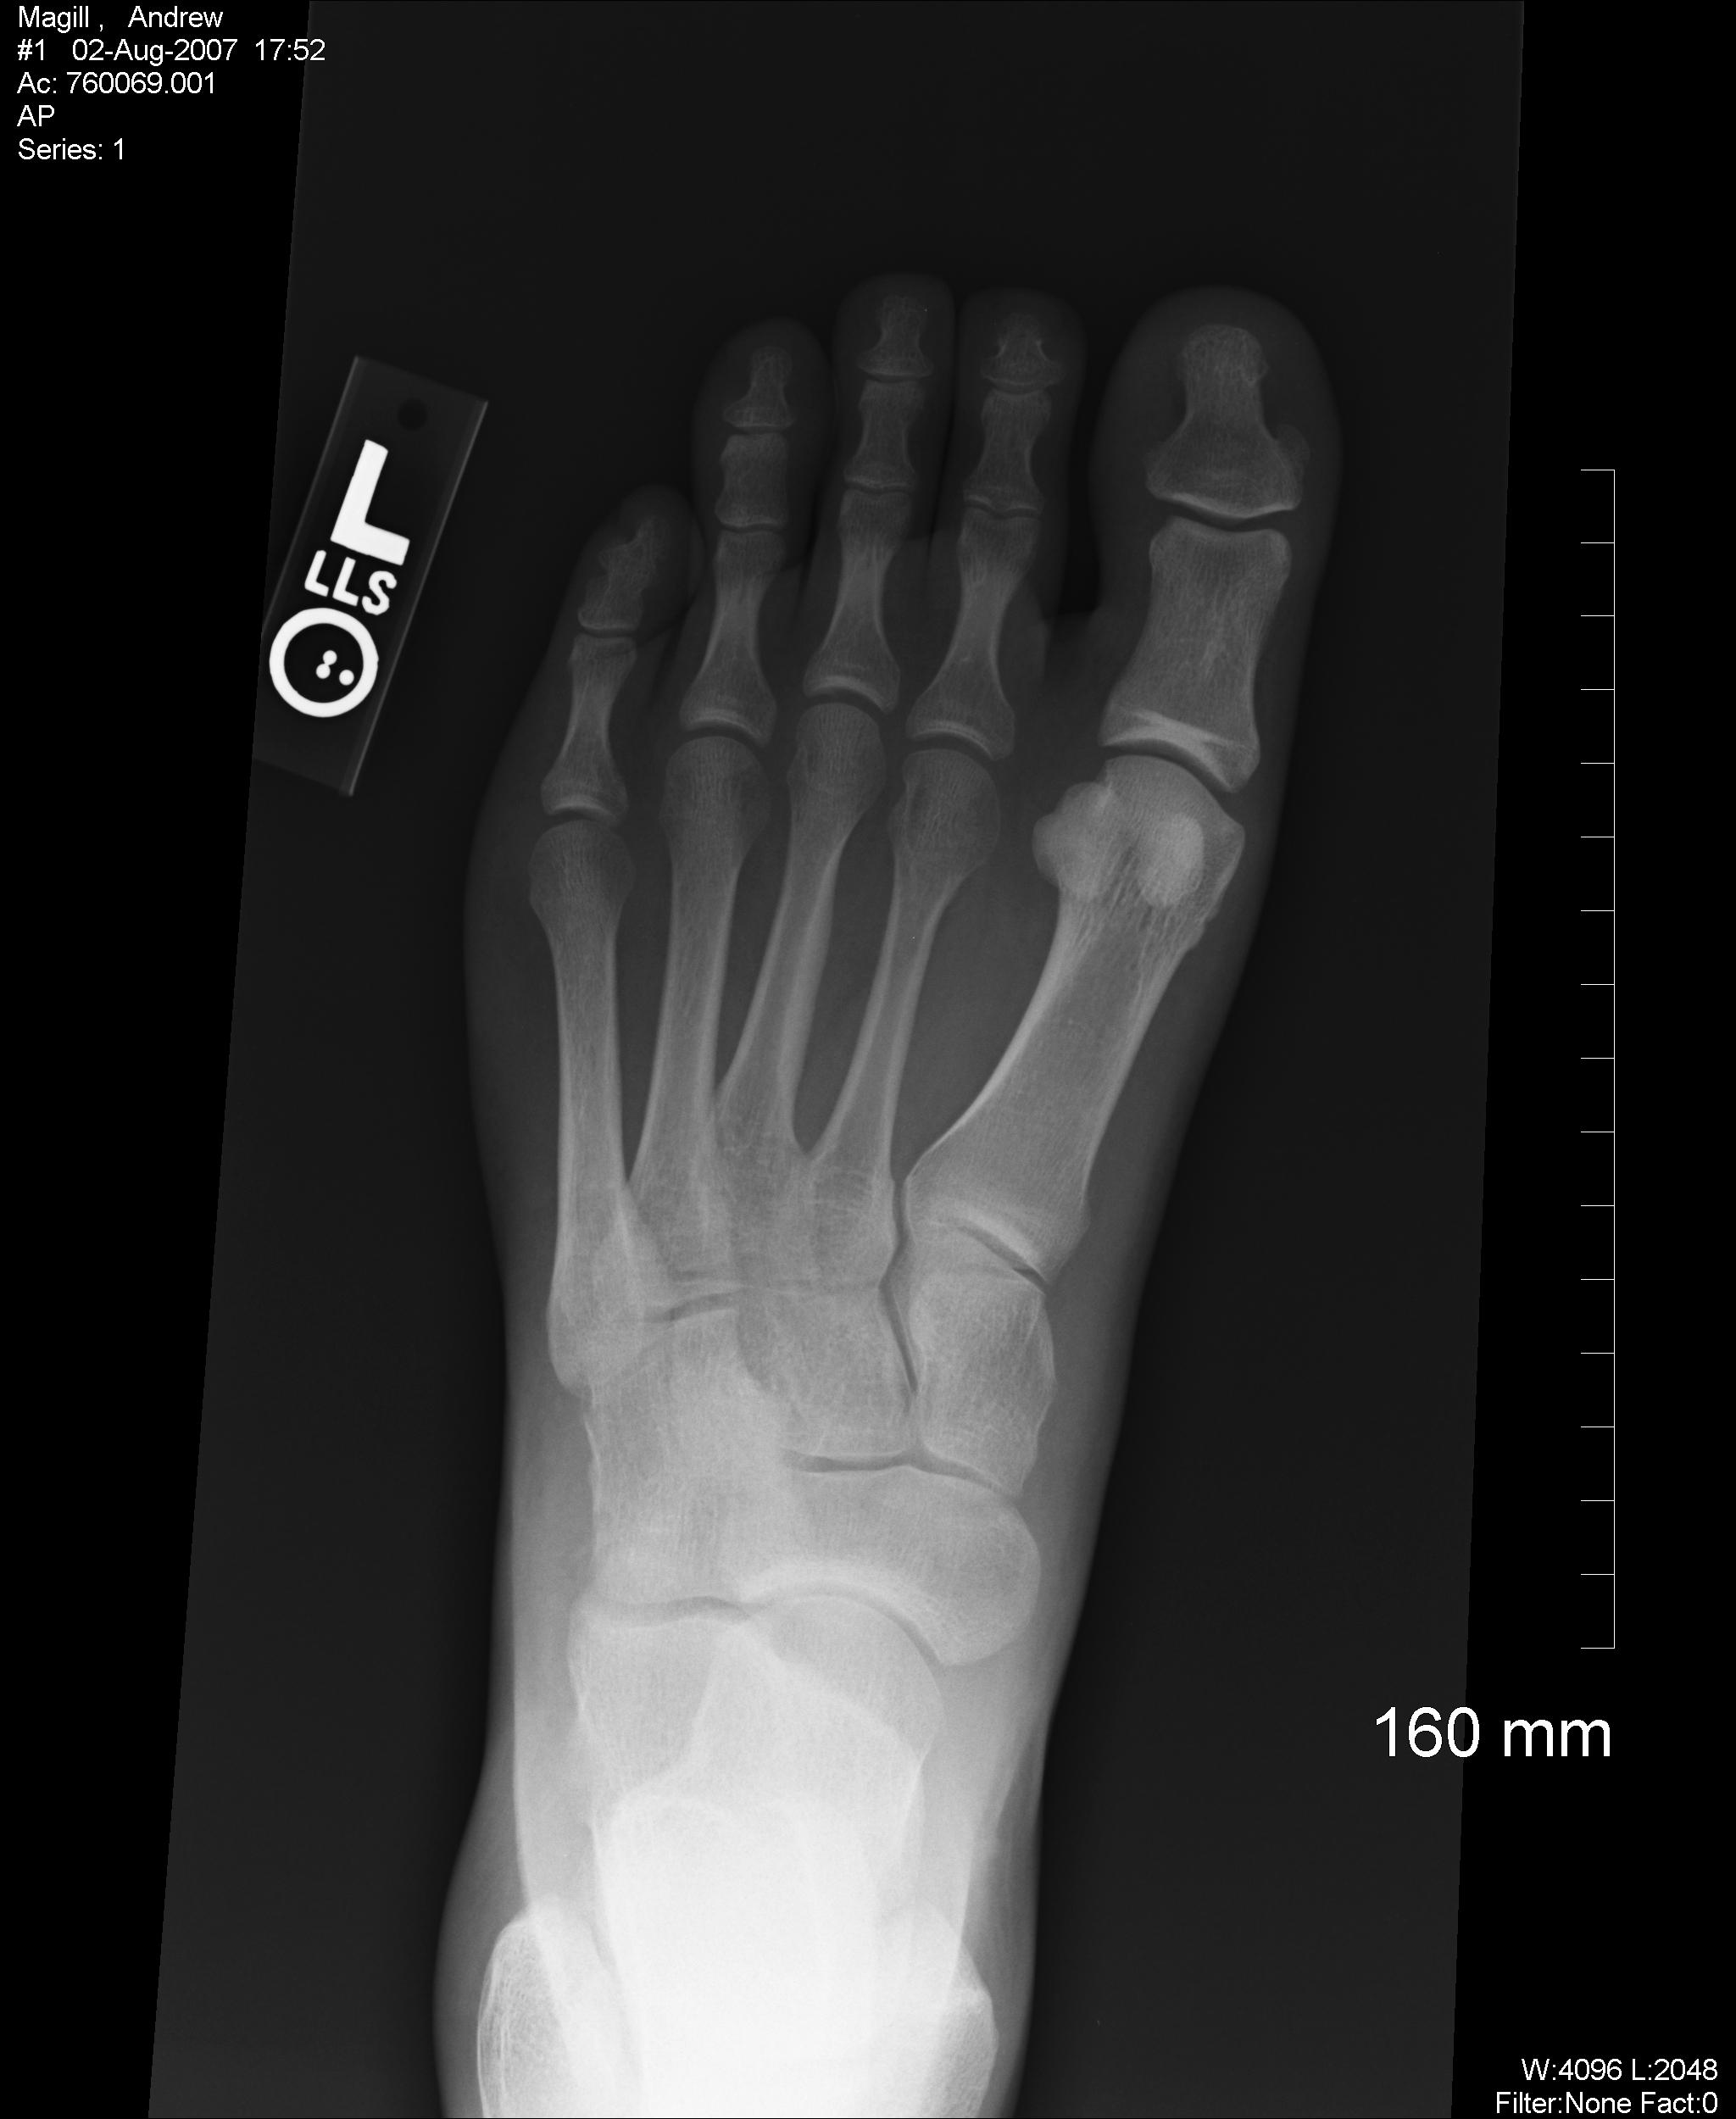 File:X-ray foot 1.jpg